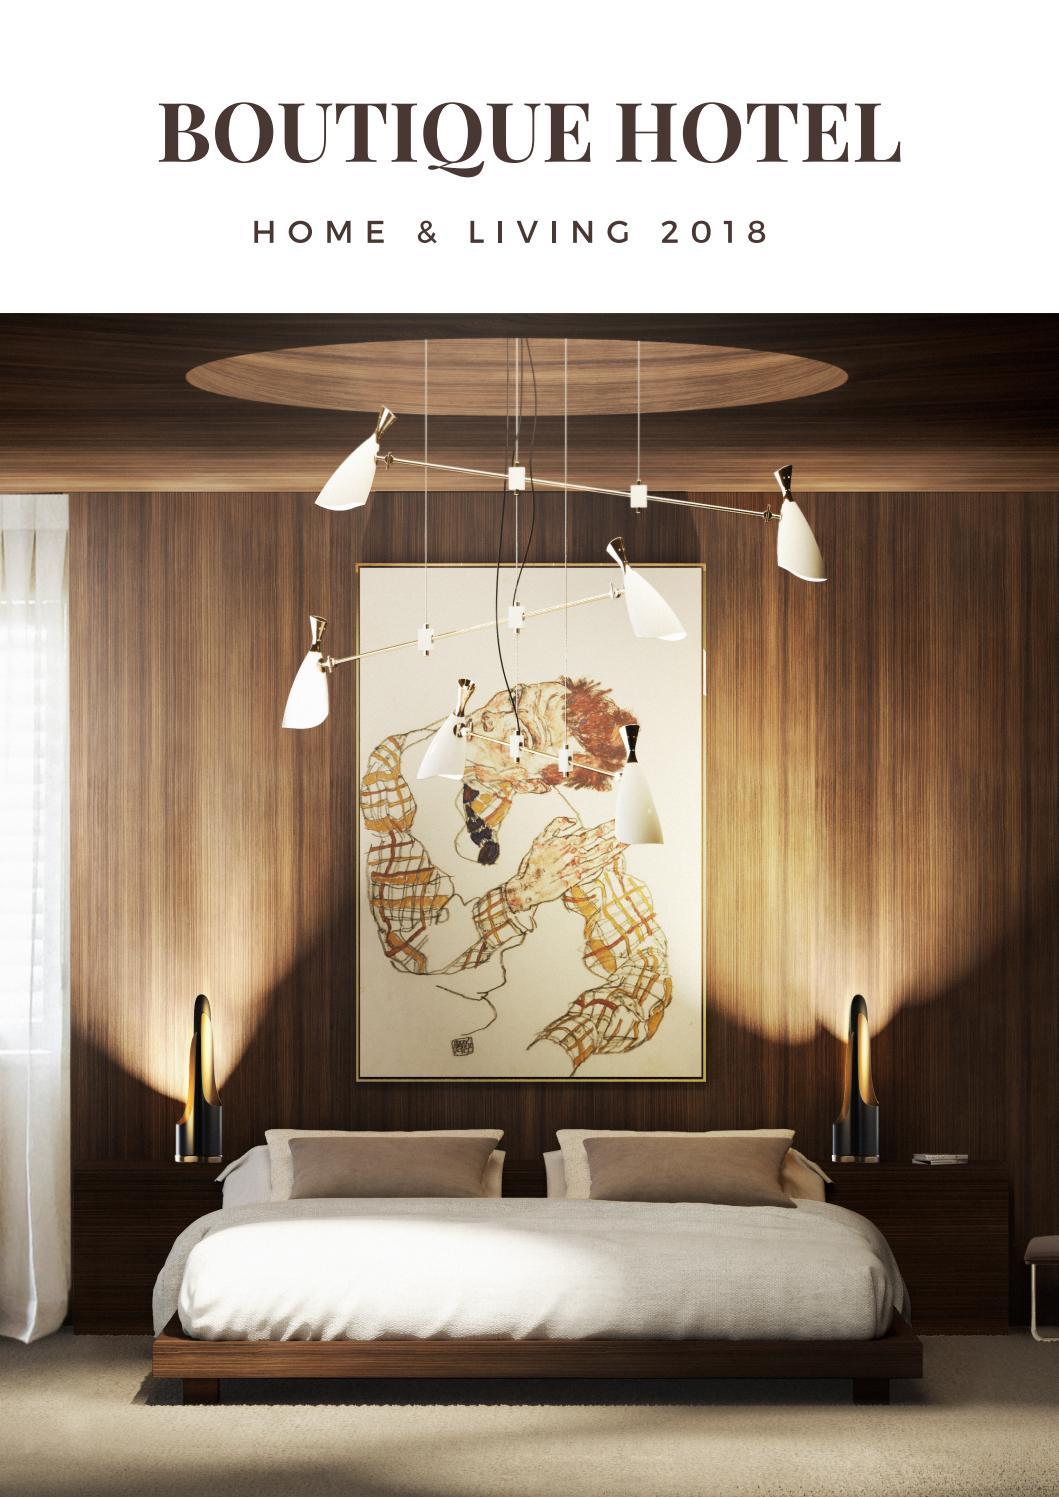 Boutique hotel home living 2018 by home living for Designhotel duderstadt